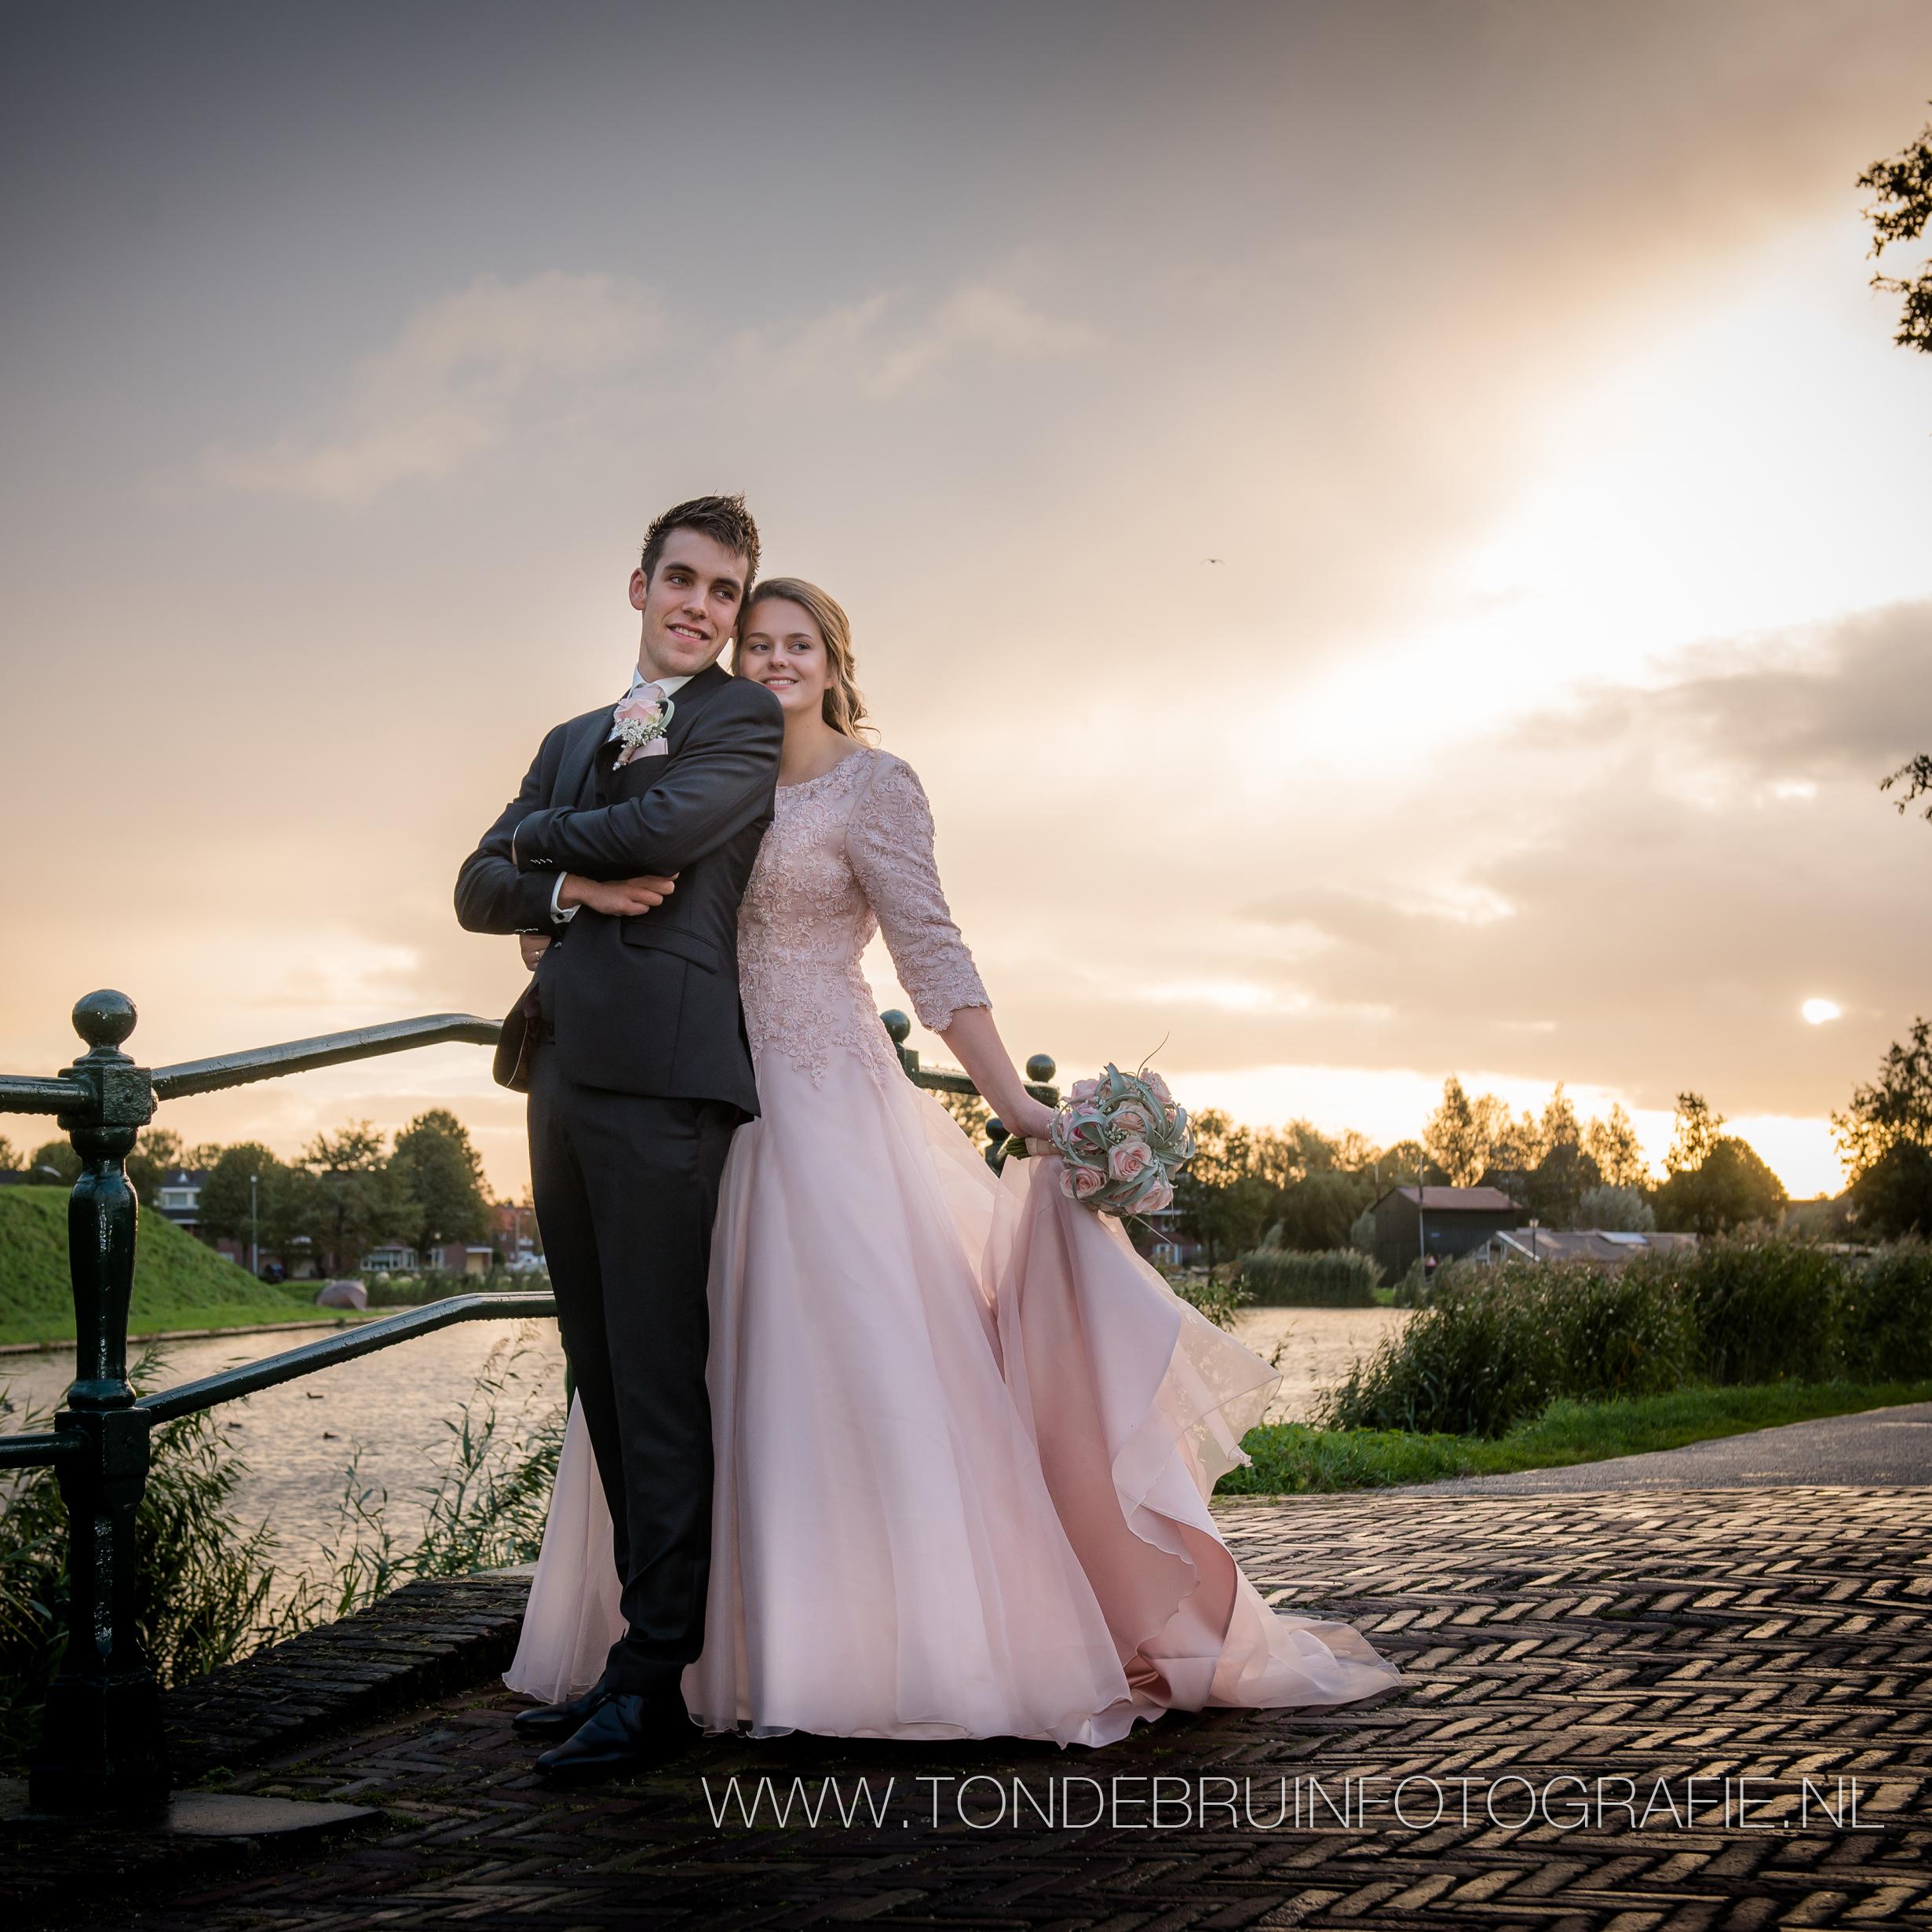 17-10-06 Bruidspaar Jan Willem en Annemarie de Jong 6 oktober 2017